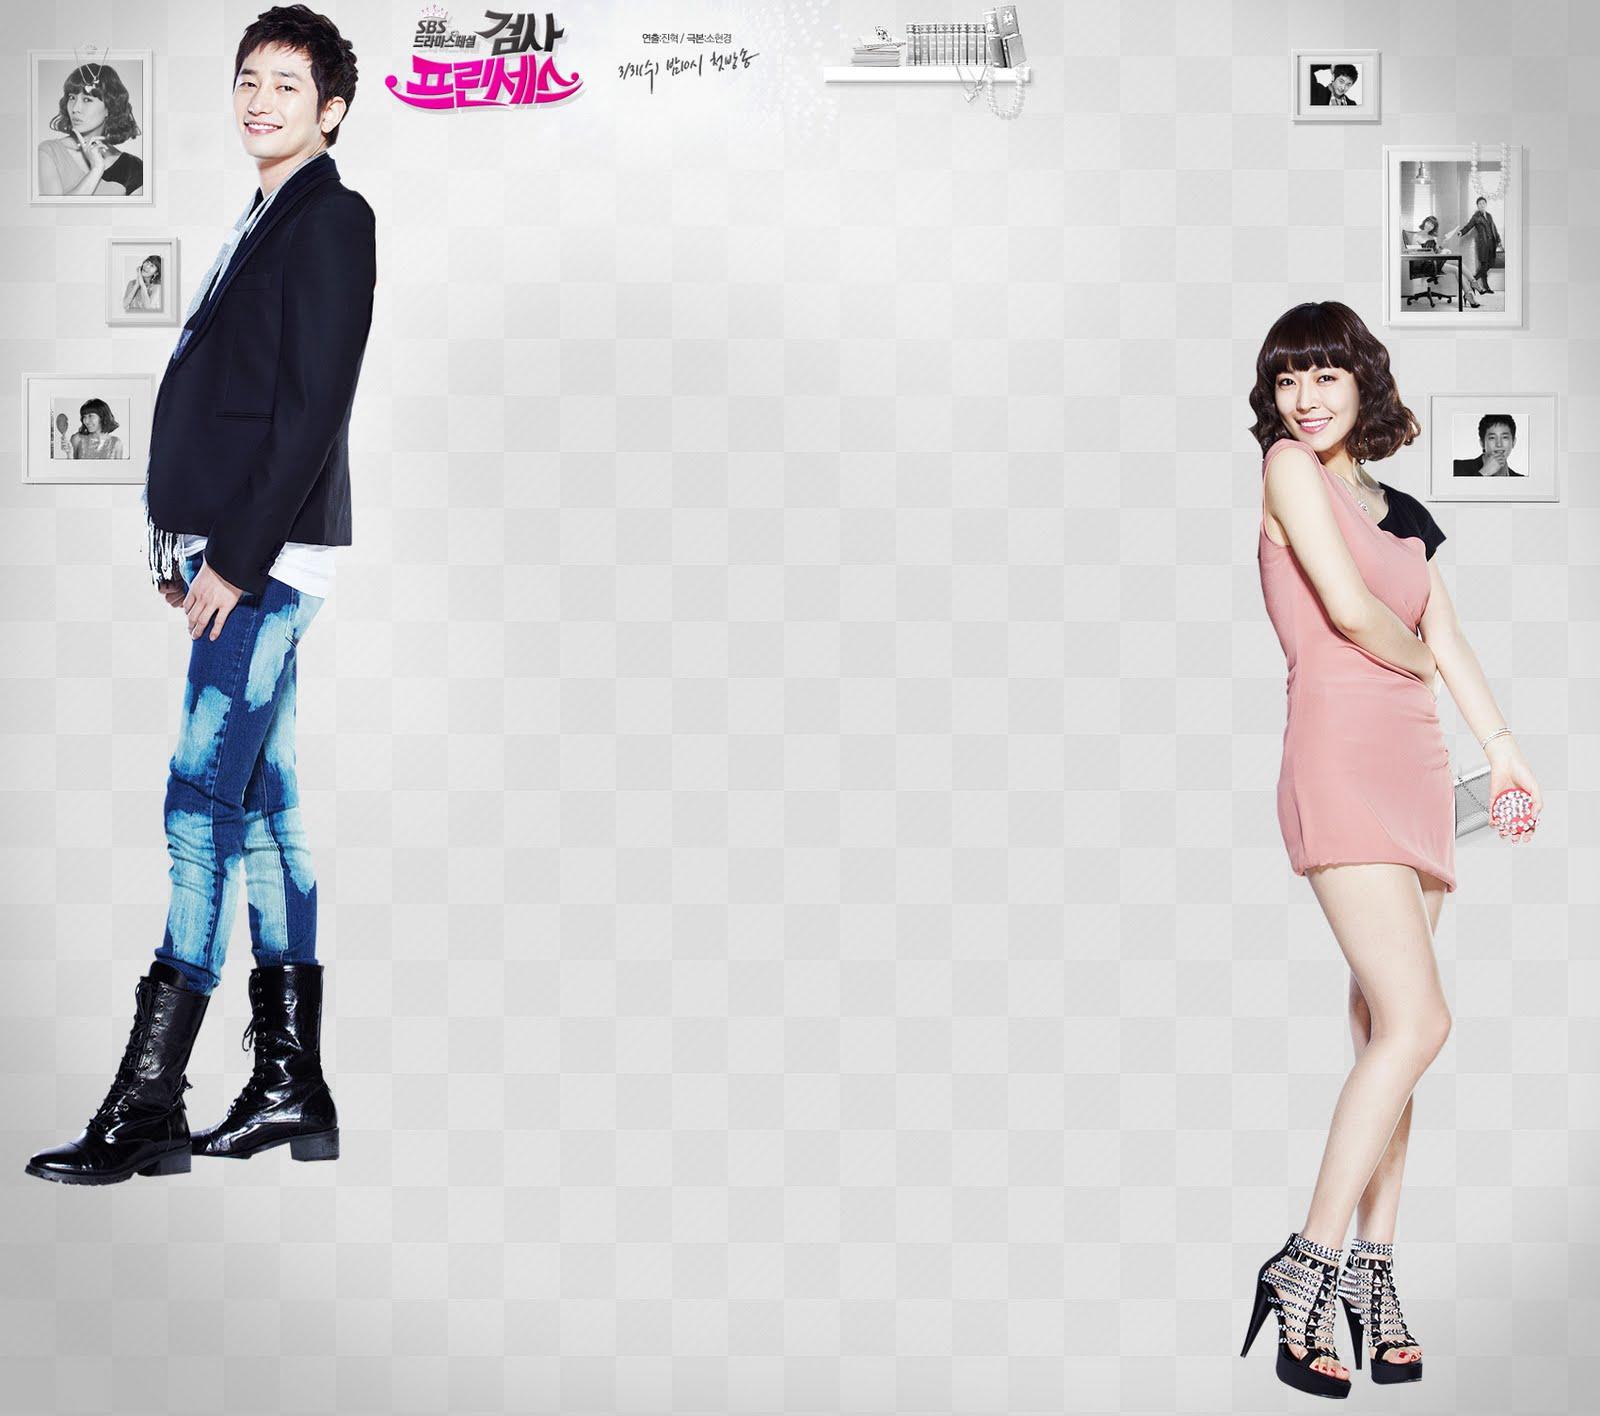 http://3.bp.blogspot.com/_fDnOMEO_8lg/S7n7F32MoKI/AAAAAAAADoc/V6hOXTDsGeo/s1600/wallpaper03.jpg